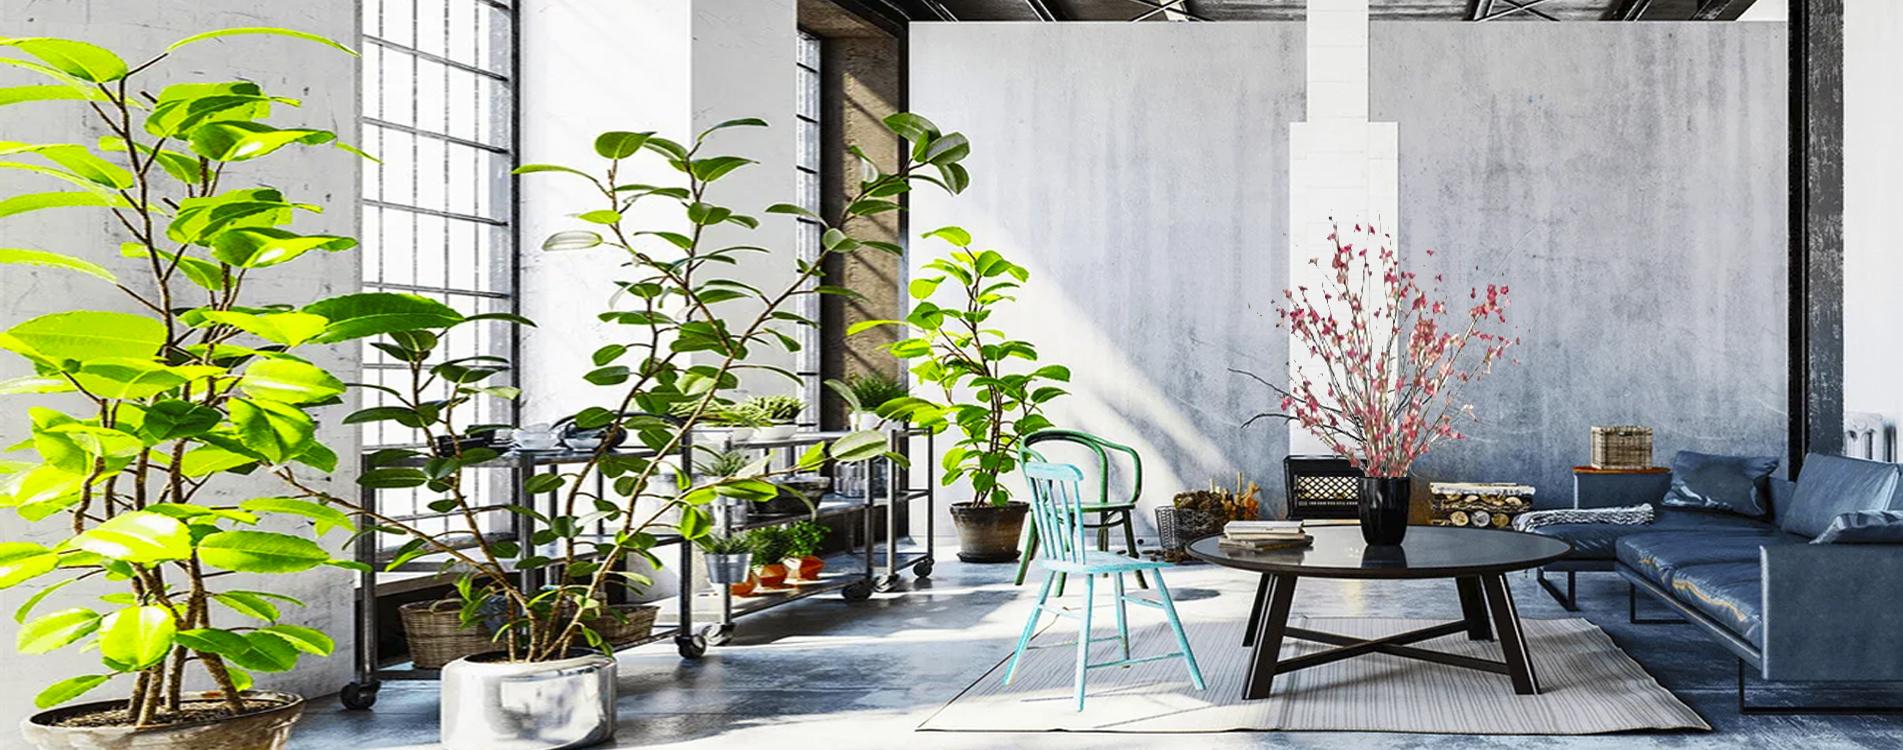 Zohrab Bauer Architects Green 79psd